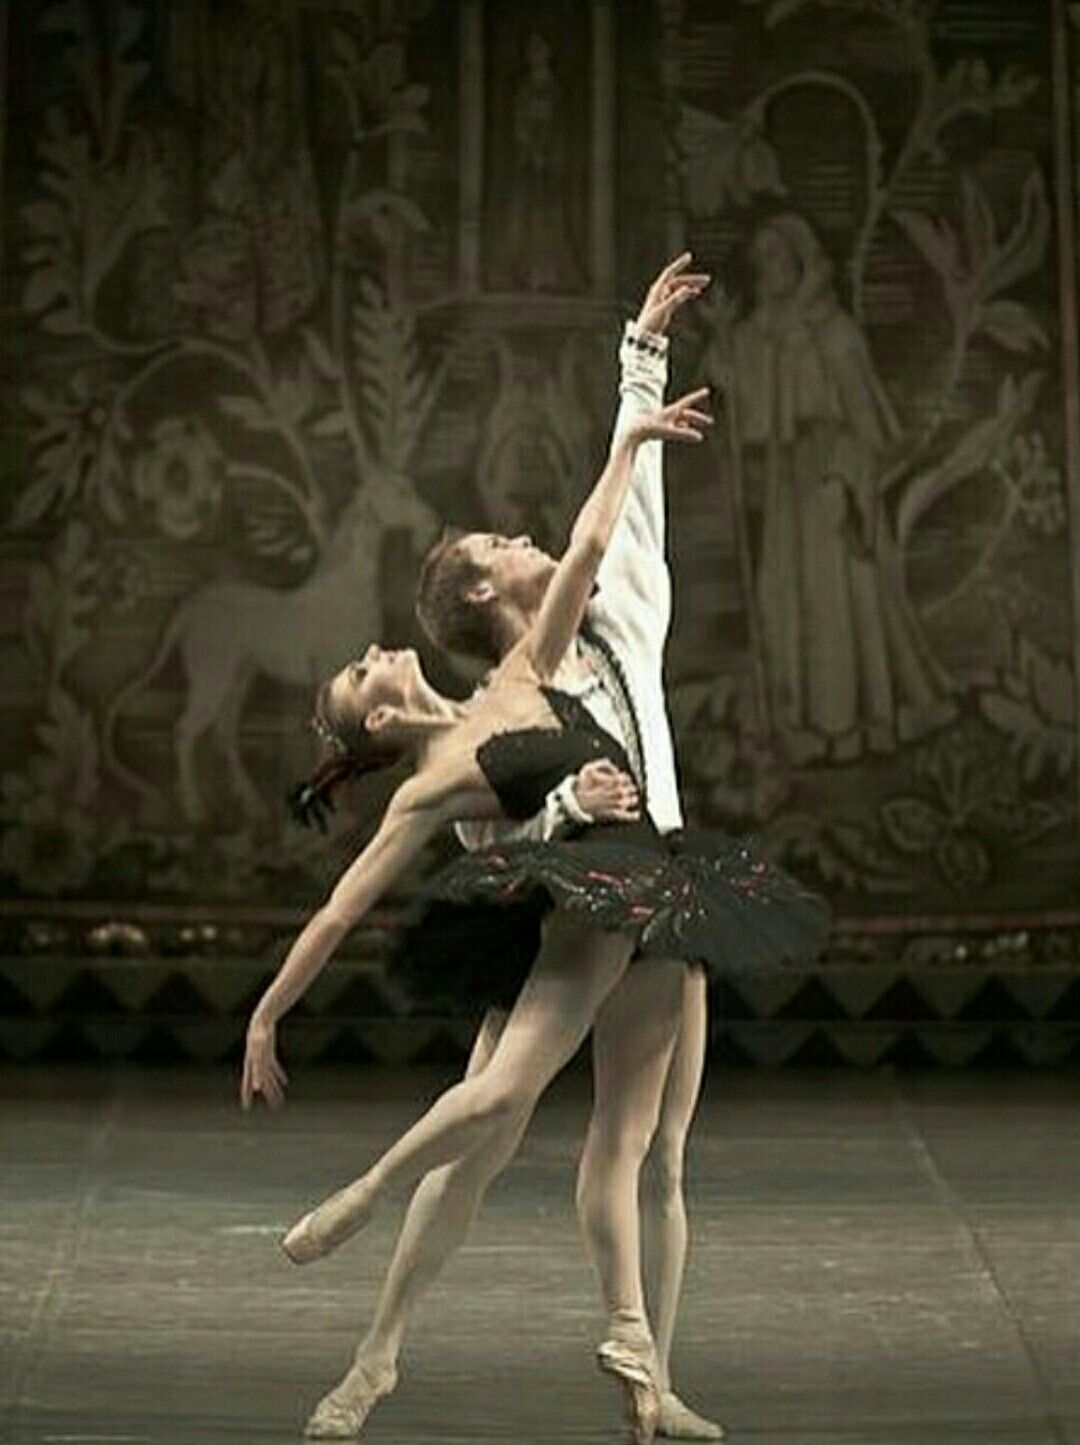 Pin by Liza Dinata on PAS DE DEUX Ballet beautiful